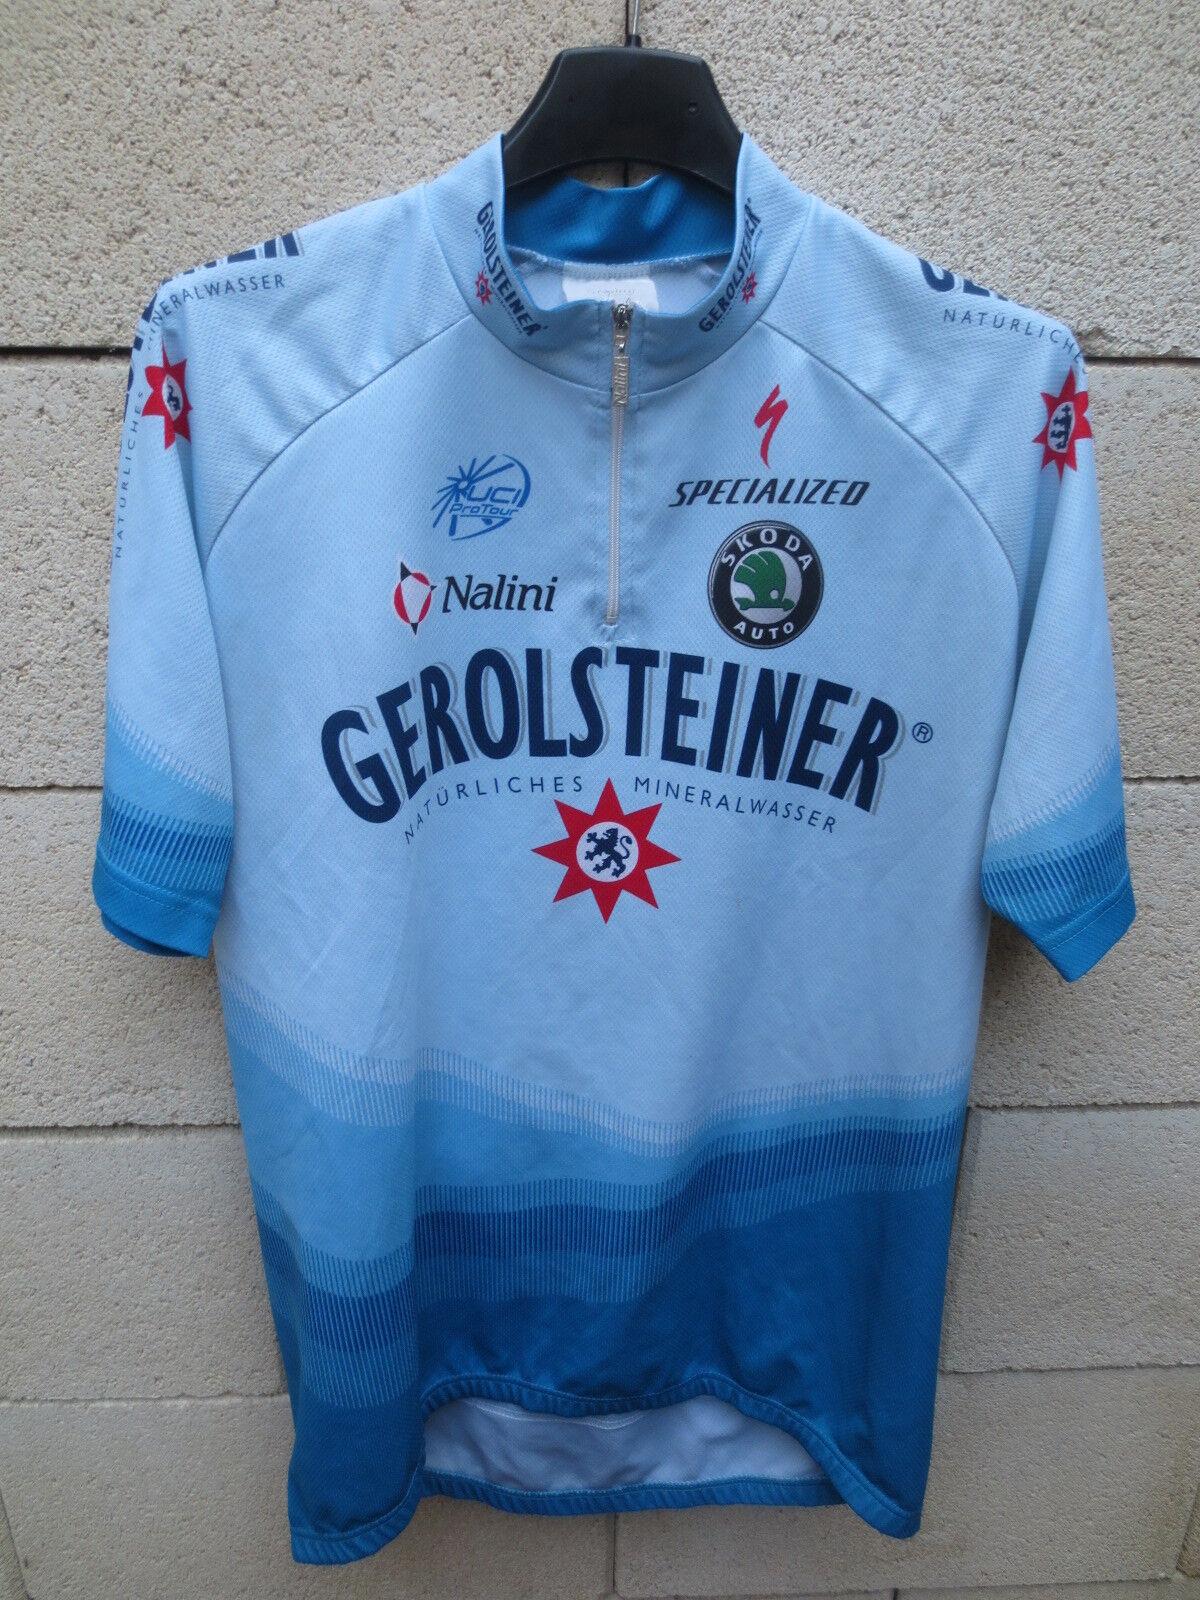 Maillot cycliste GEROLSTEINER UCI PRO TOUR 2005 Nalini trikot TOTSCHNIG Geor 4 L